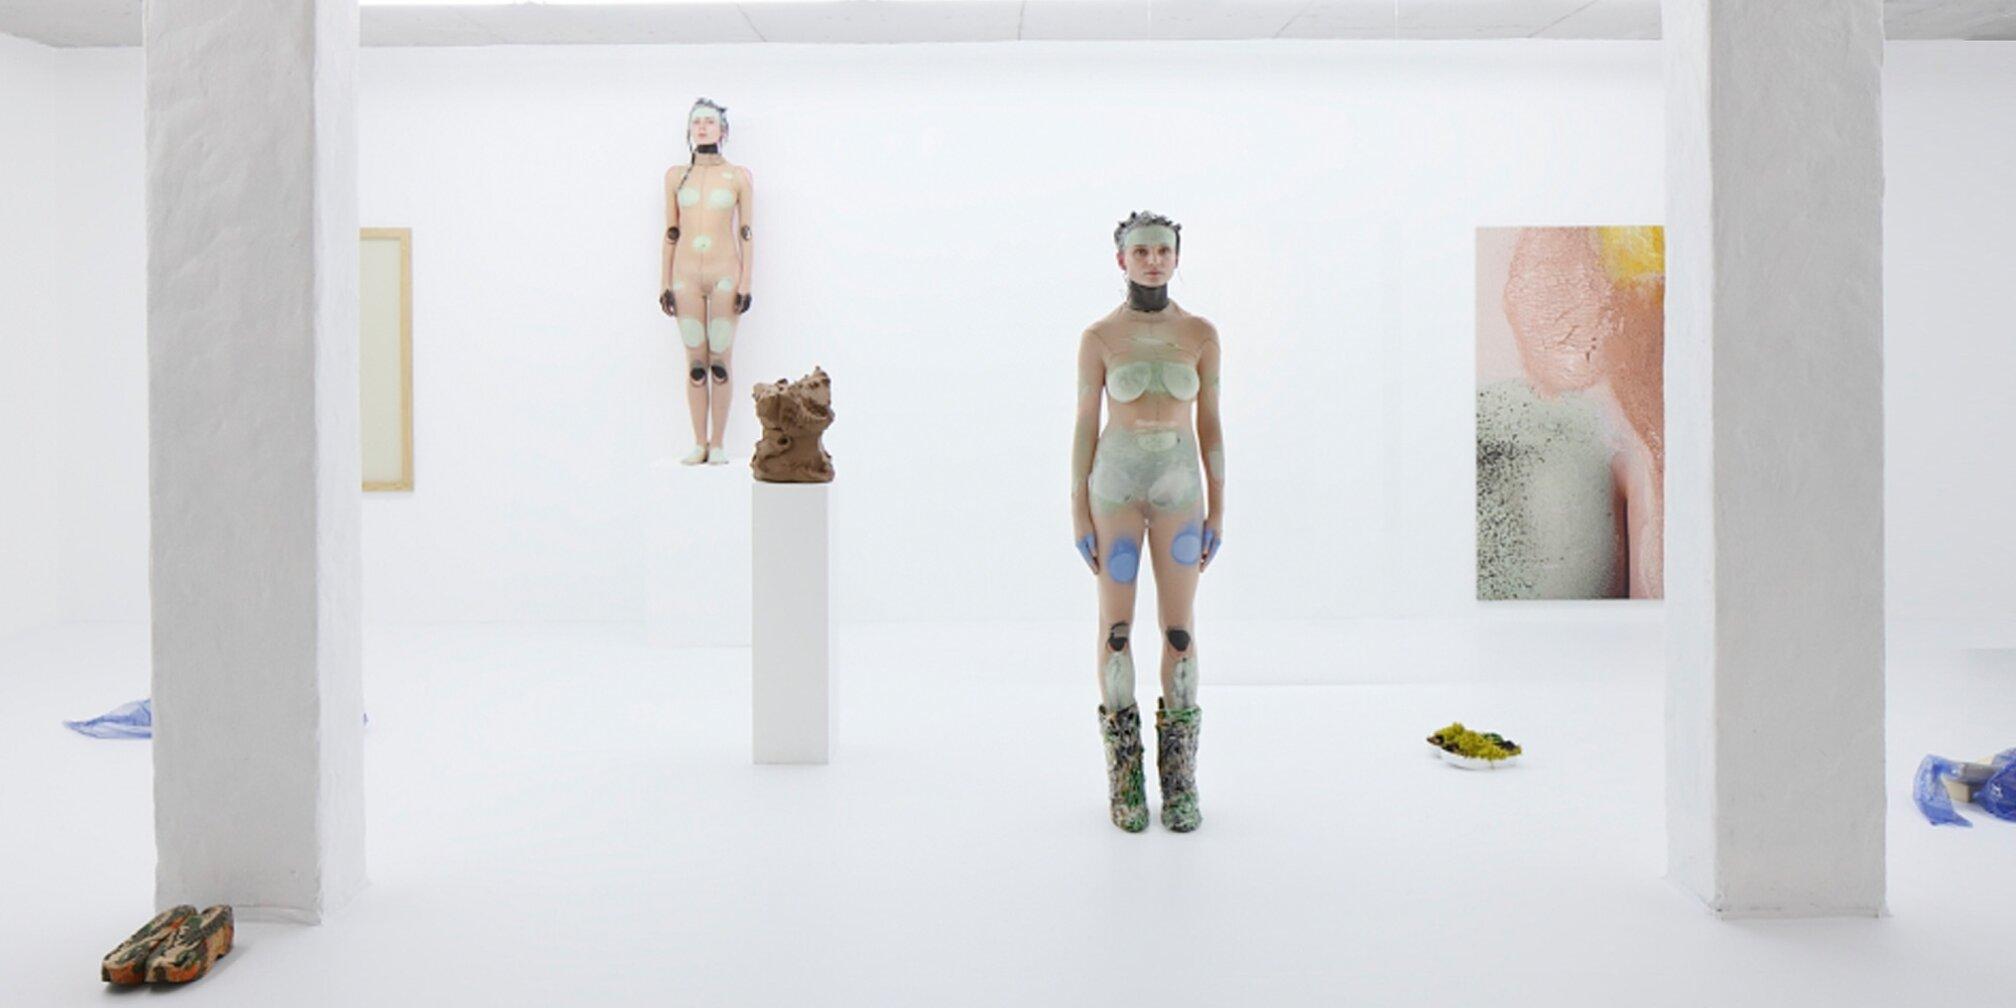 Donna Huanca, Polystyrene's Braces. Installation view, 2015. Kim? Contemporary Art Centre, Riga